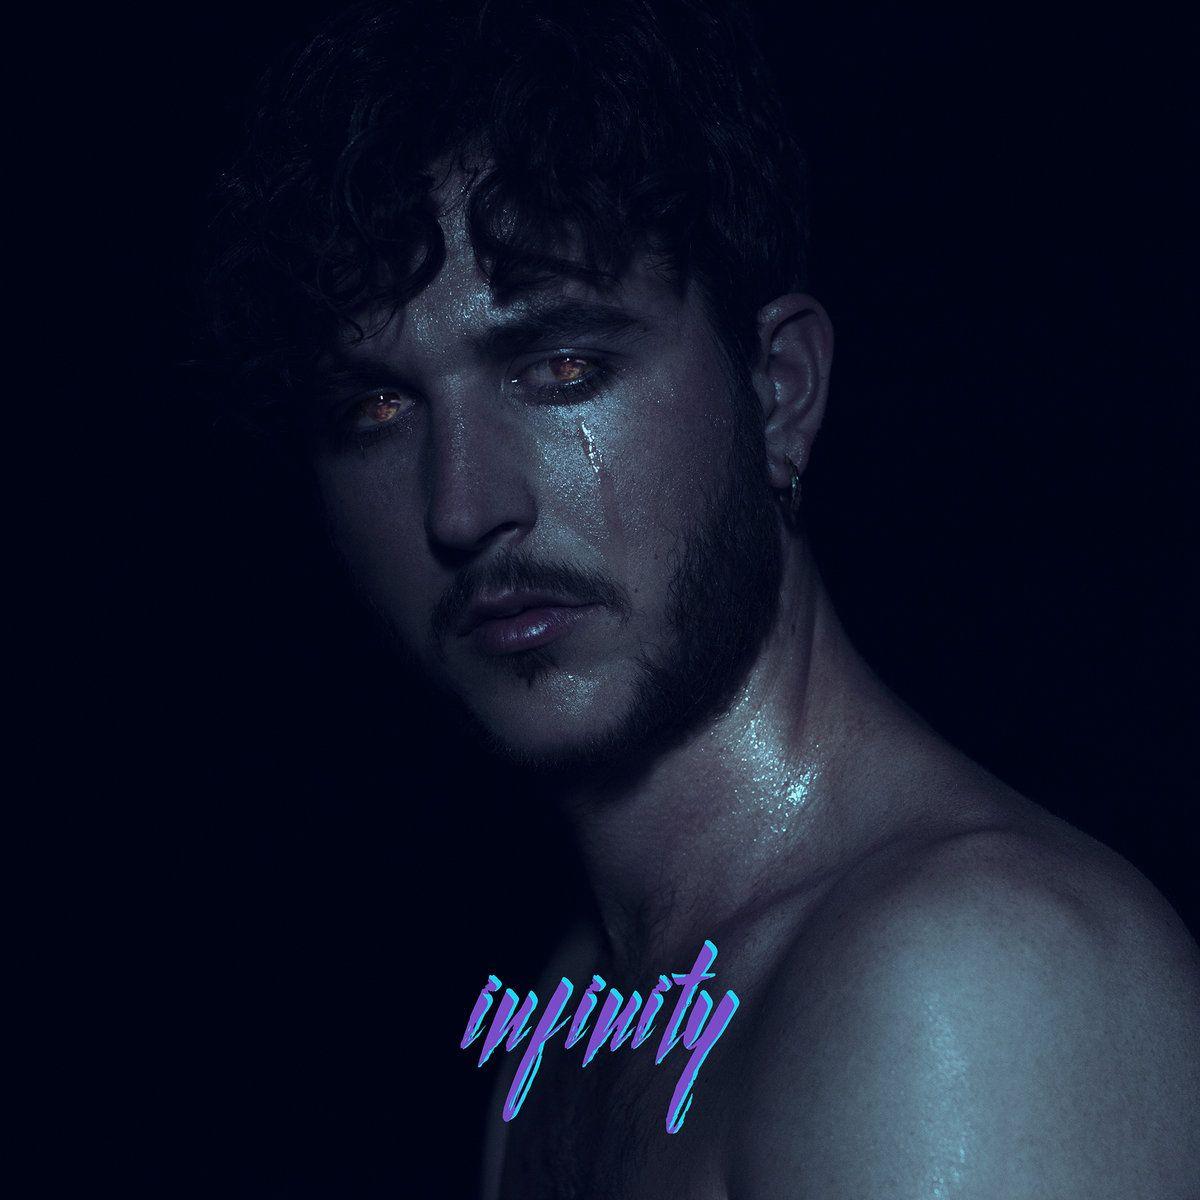 Oscar - Infinity album cover